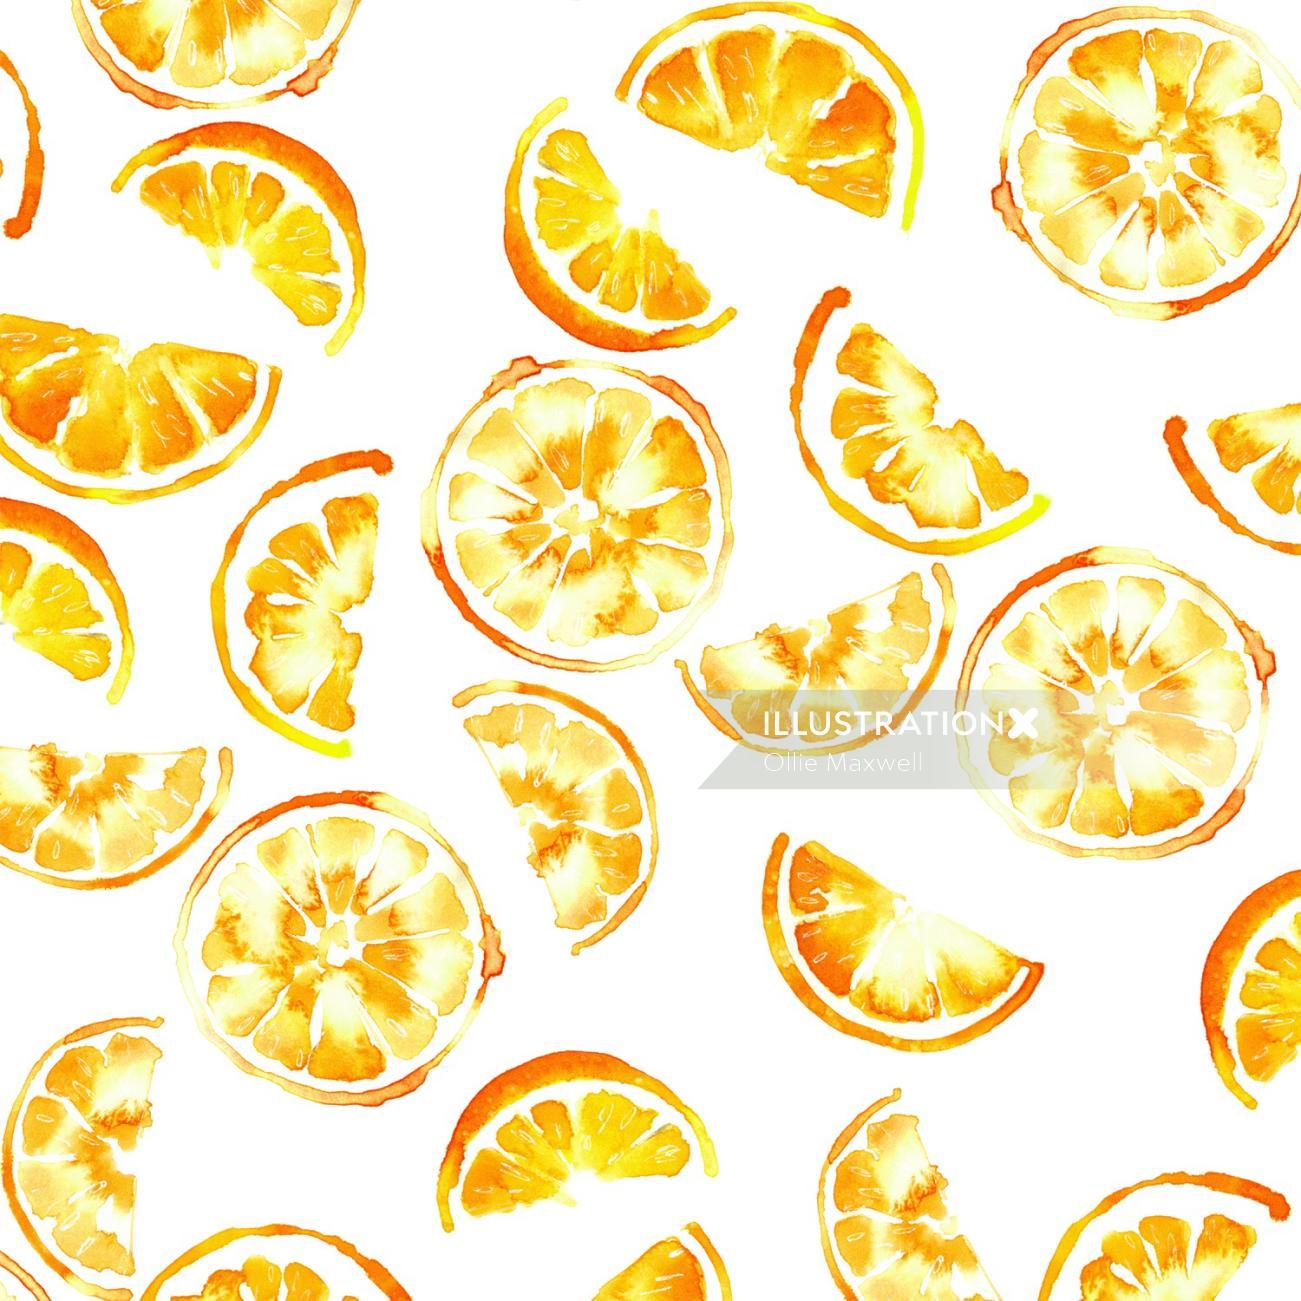 Illustration of Orange slices